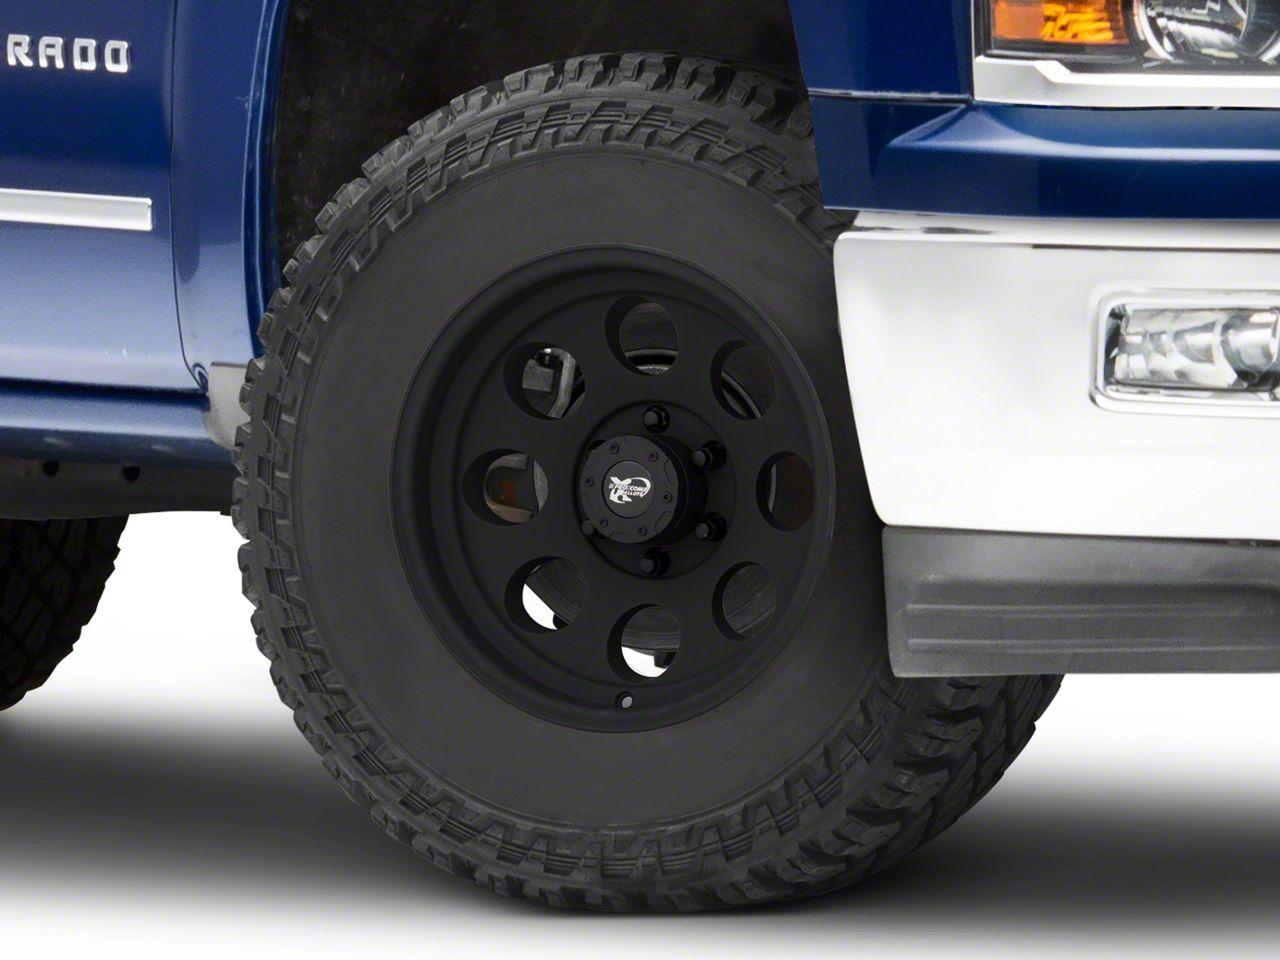 Pro Comp Series 7069 Matte Black 6-Lug Wheel - 17x9 (99-18 Silverado 1500)